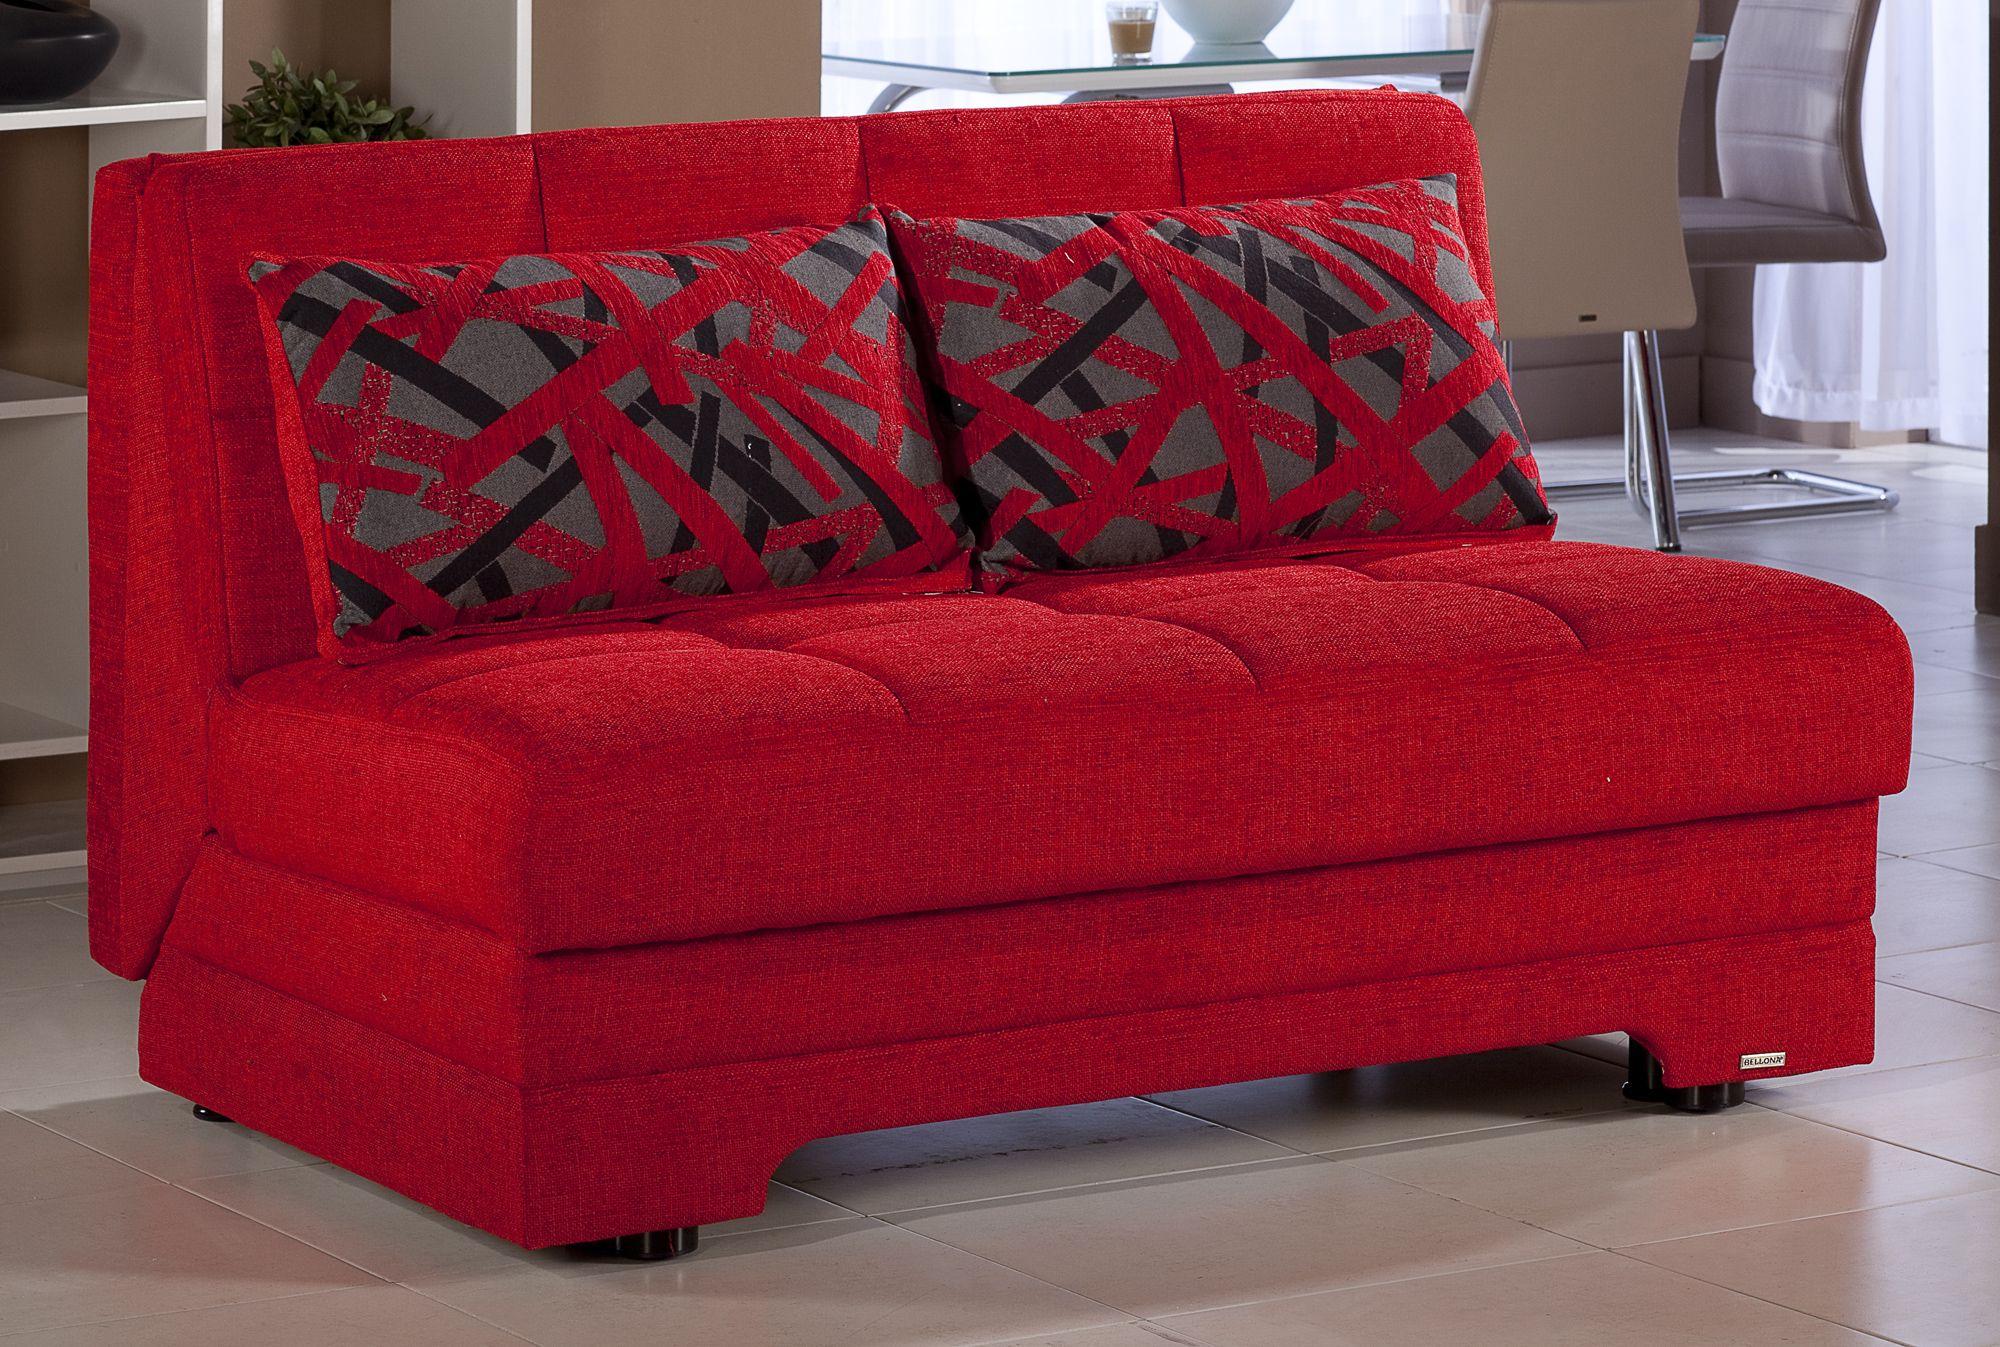 Fantastic Twist Story Red Loveseat Sleeper By Istikbal Furniture In Inzonedesignstudio Interior Chair Design Inzonedesignstudiocom